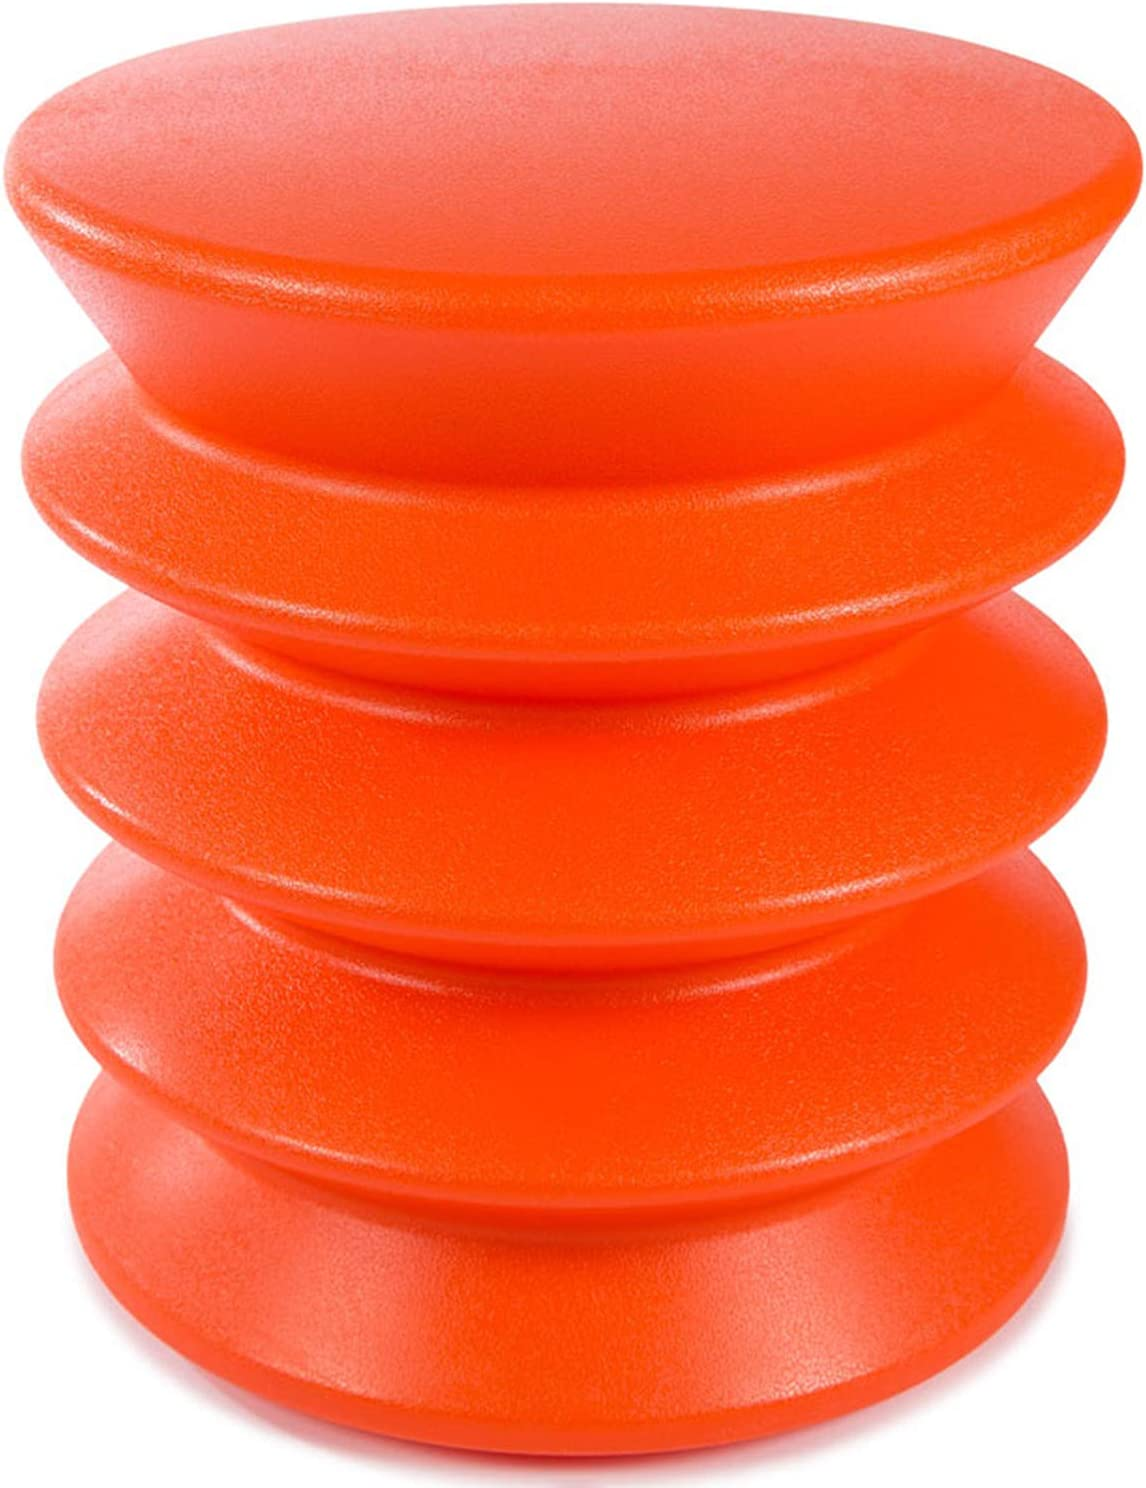 Elegant KidsErgo New item Ergonomic Stool for Active Sitting Orange